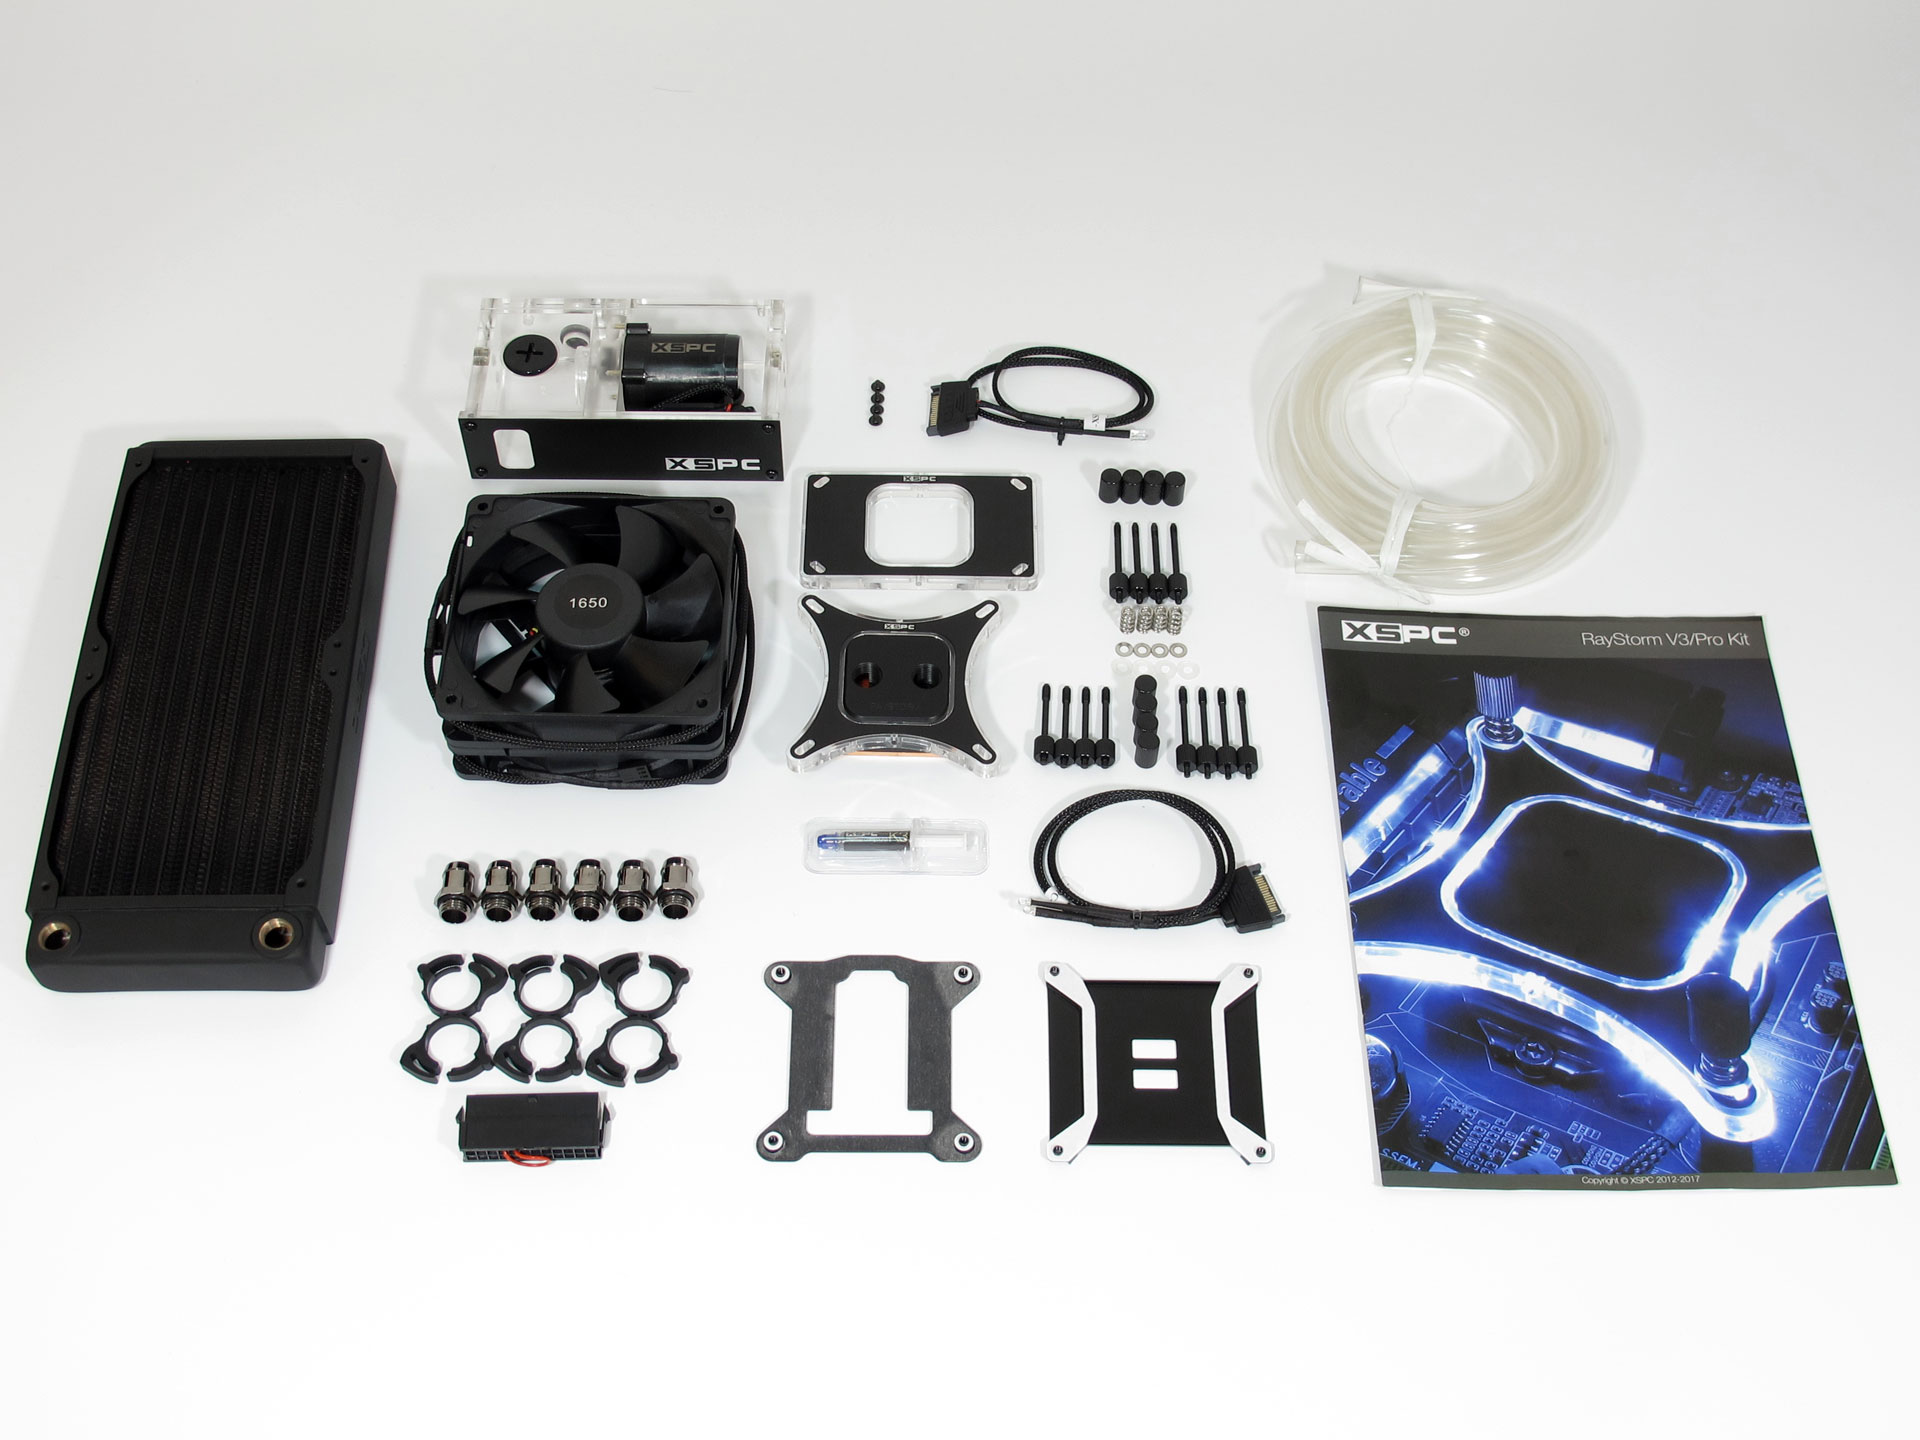 ex240-420-kit-contents.jpg